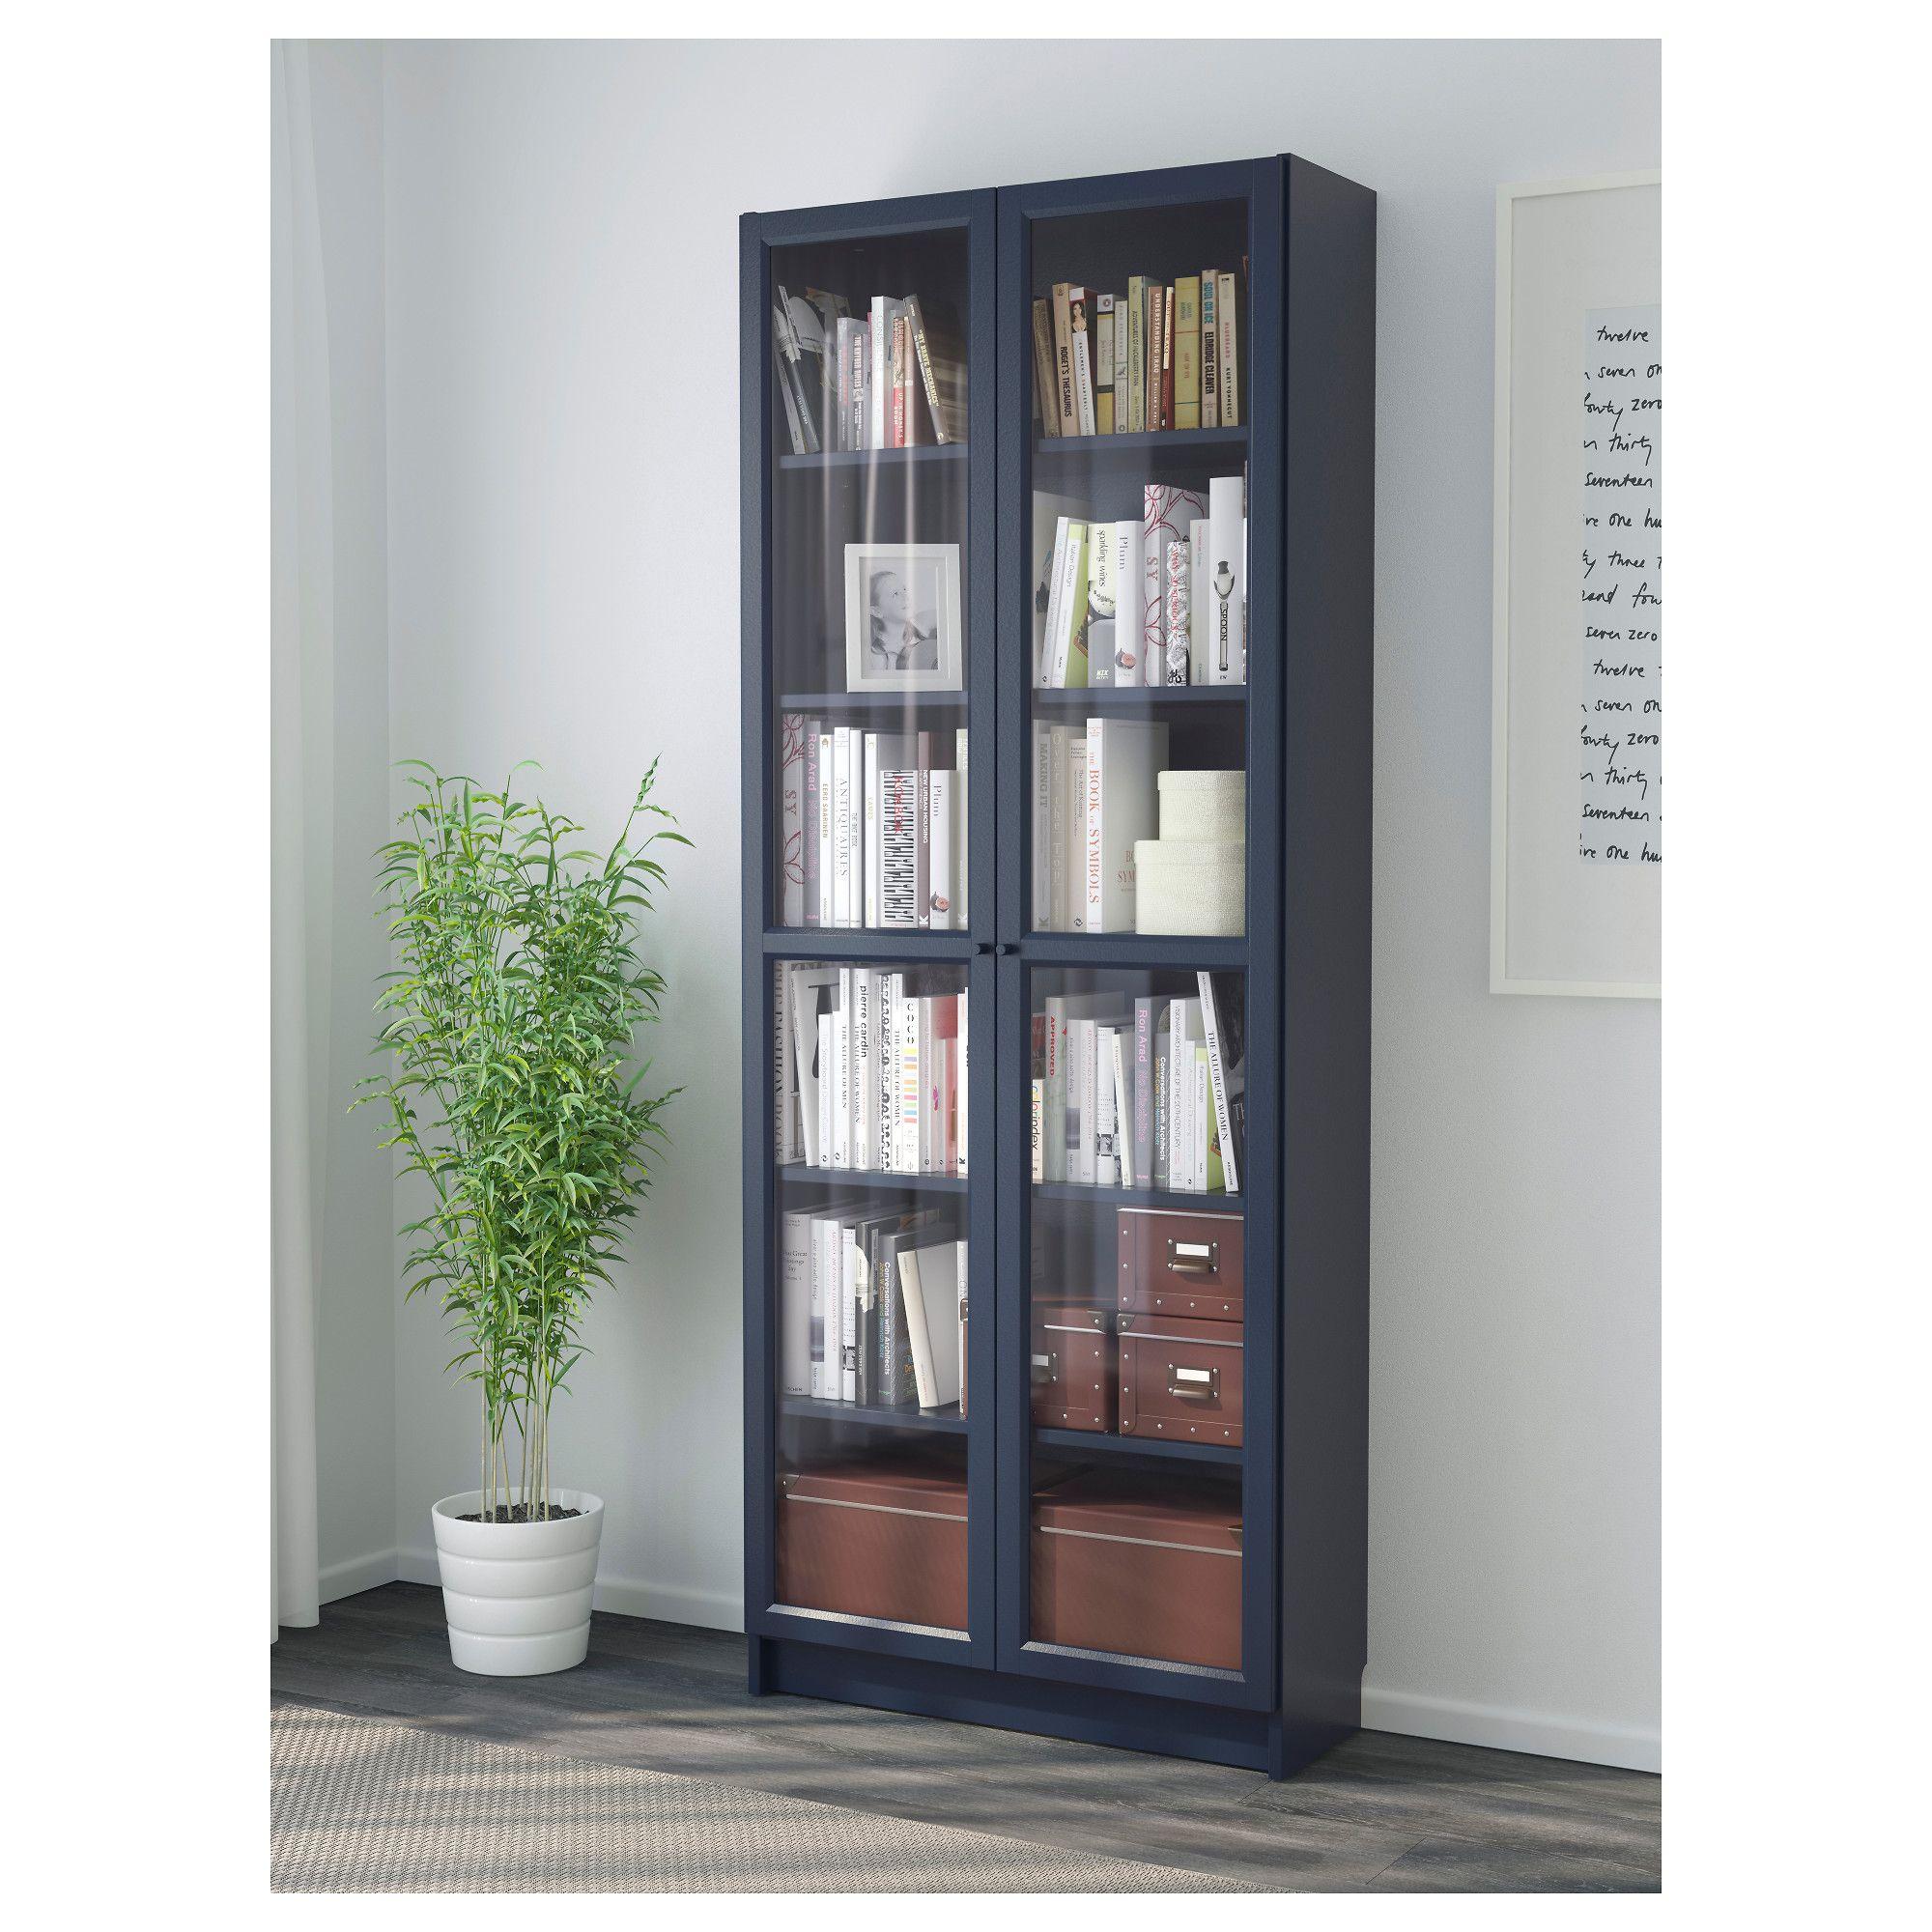 Billy Bookcase With Glass Doors Dark Blue 80x30x202 Cm Ikea  # Muebles Billy Ikea